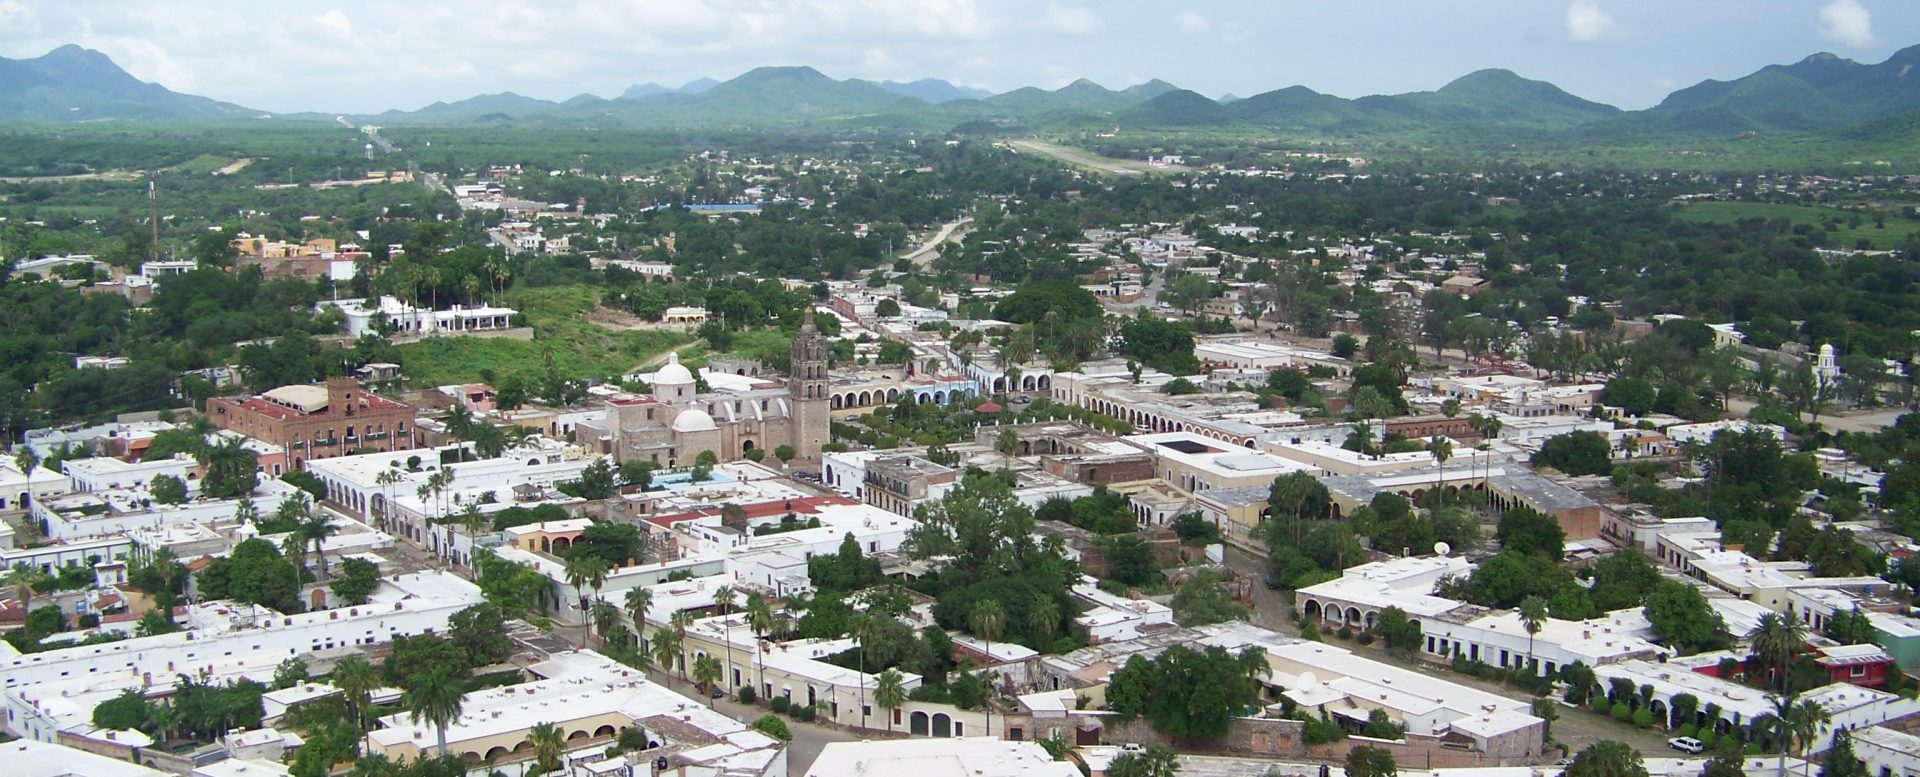 Alamos Realty – Alamos, Sonora, MX